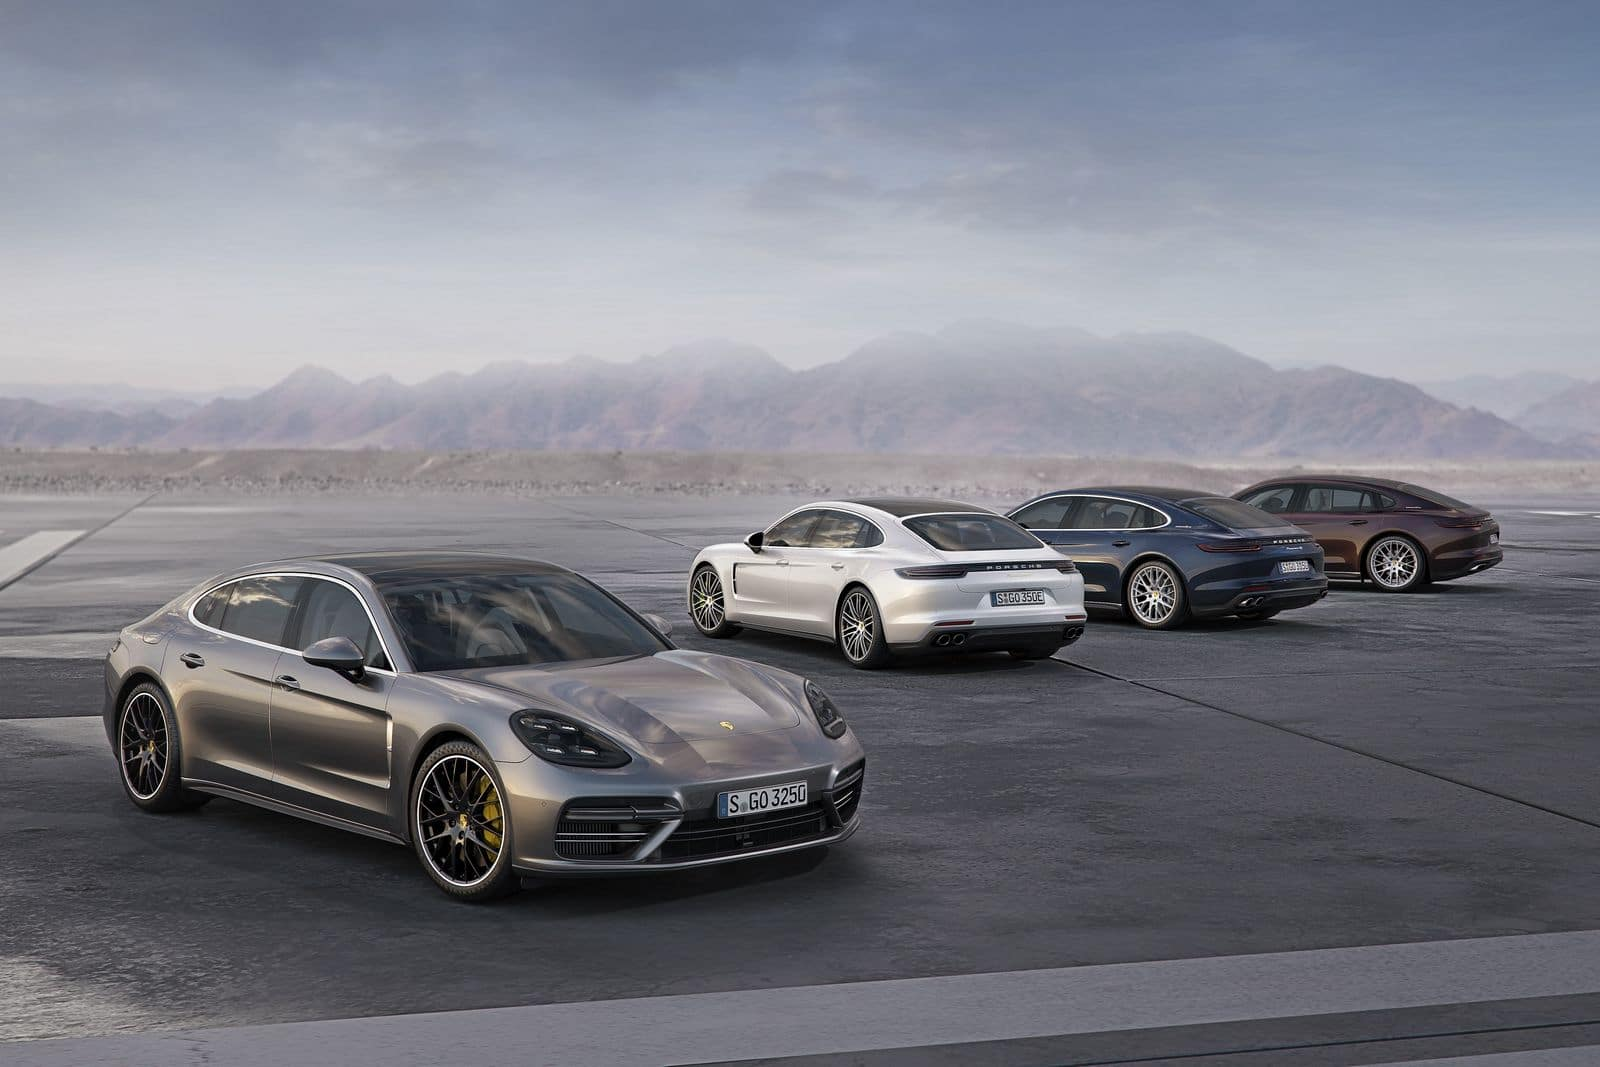 Porsche Panamera model-line up increased